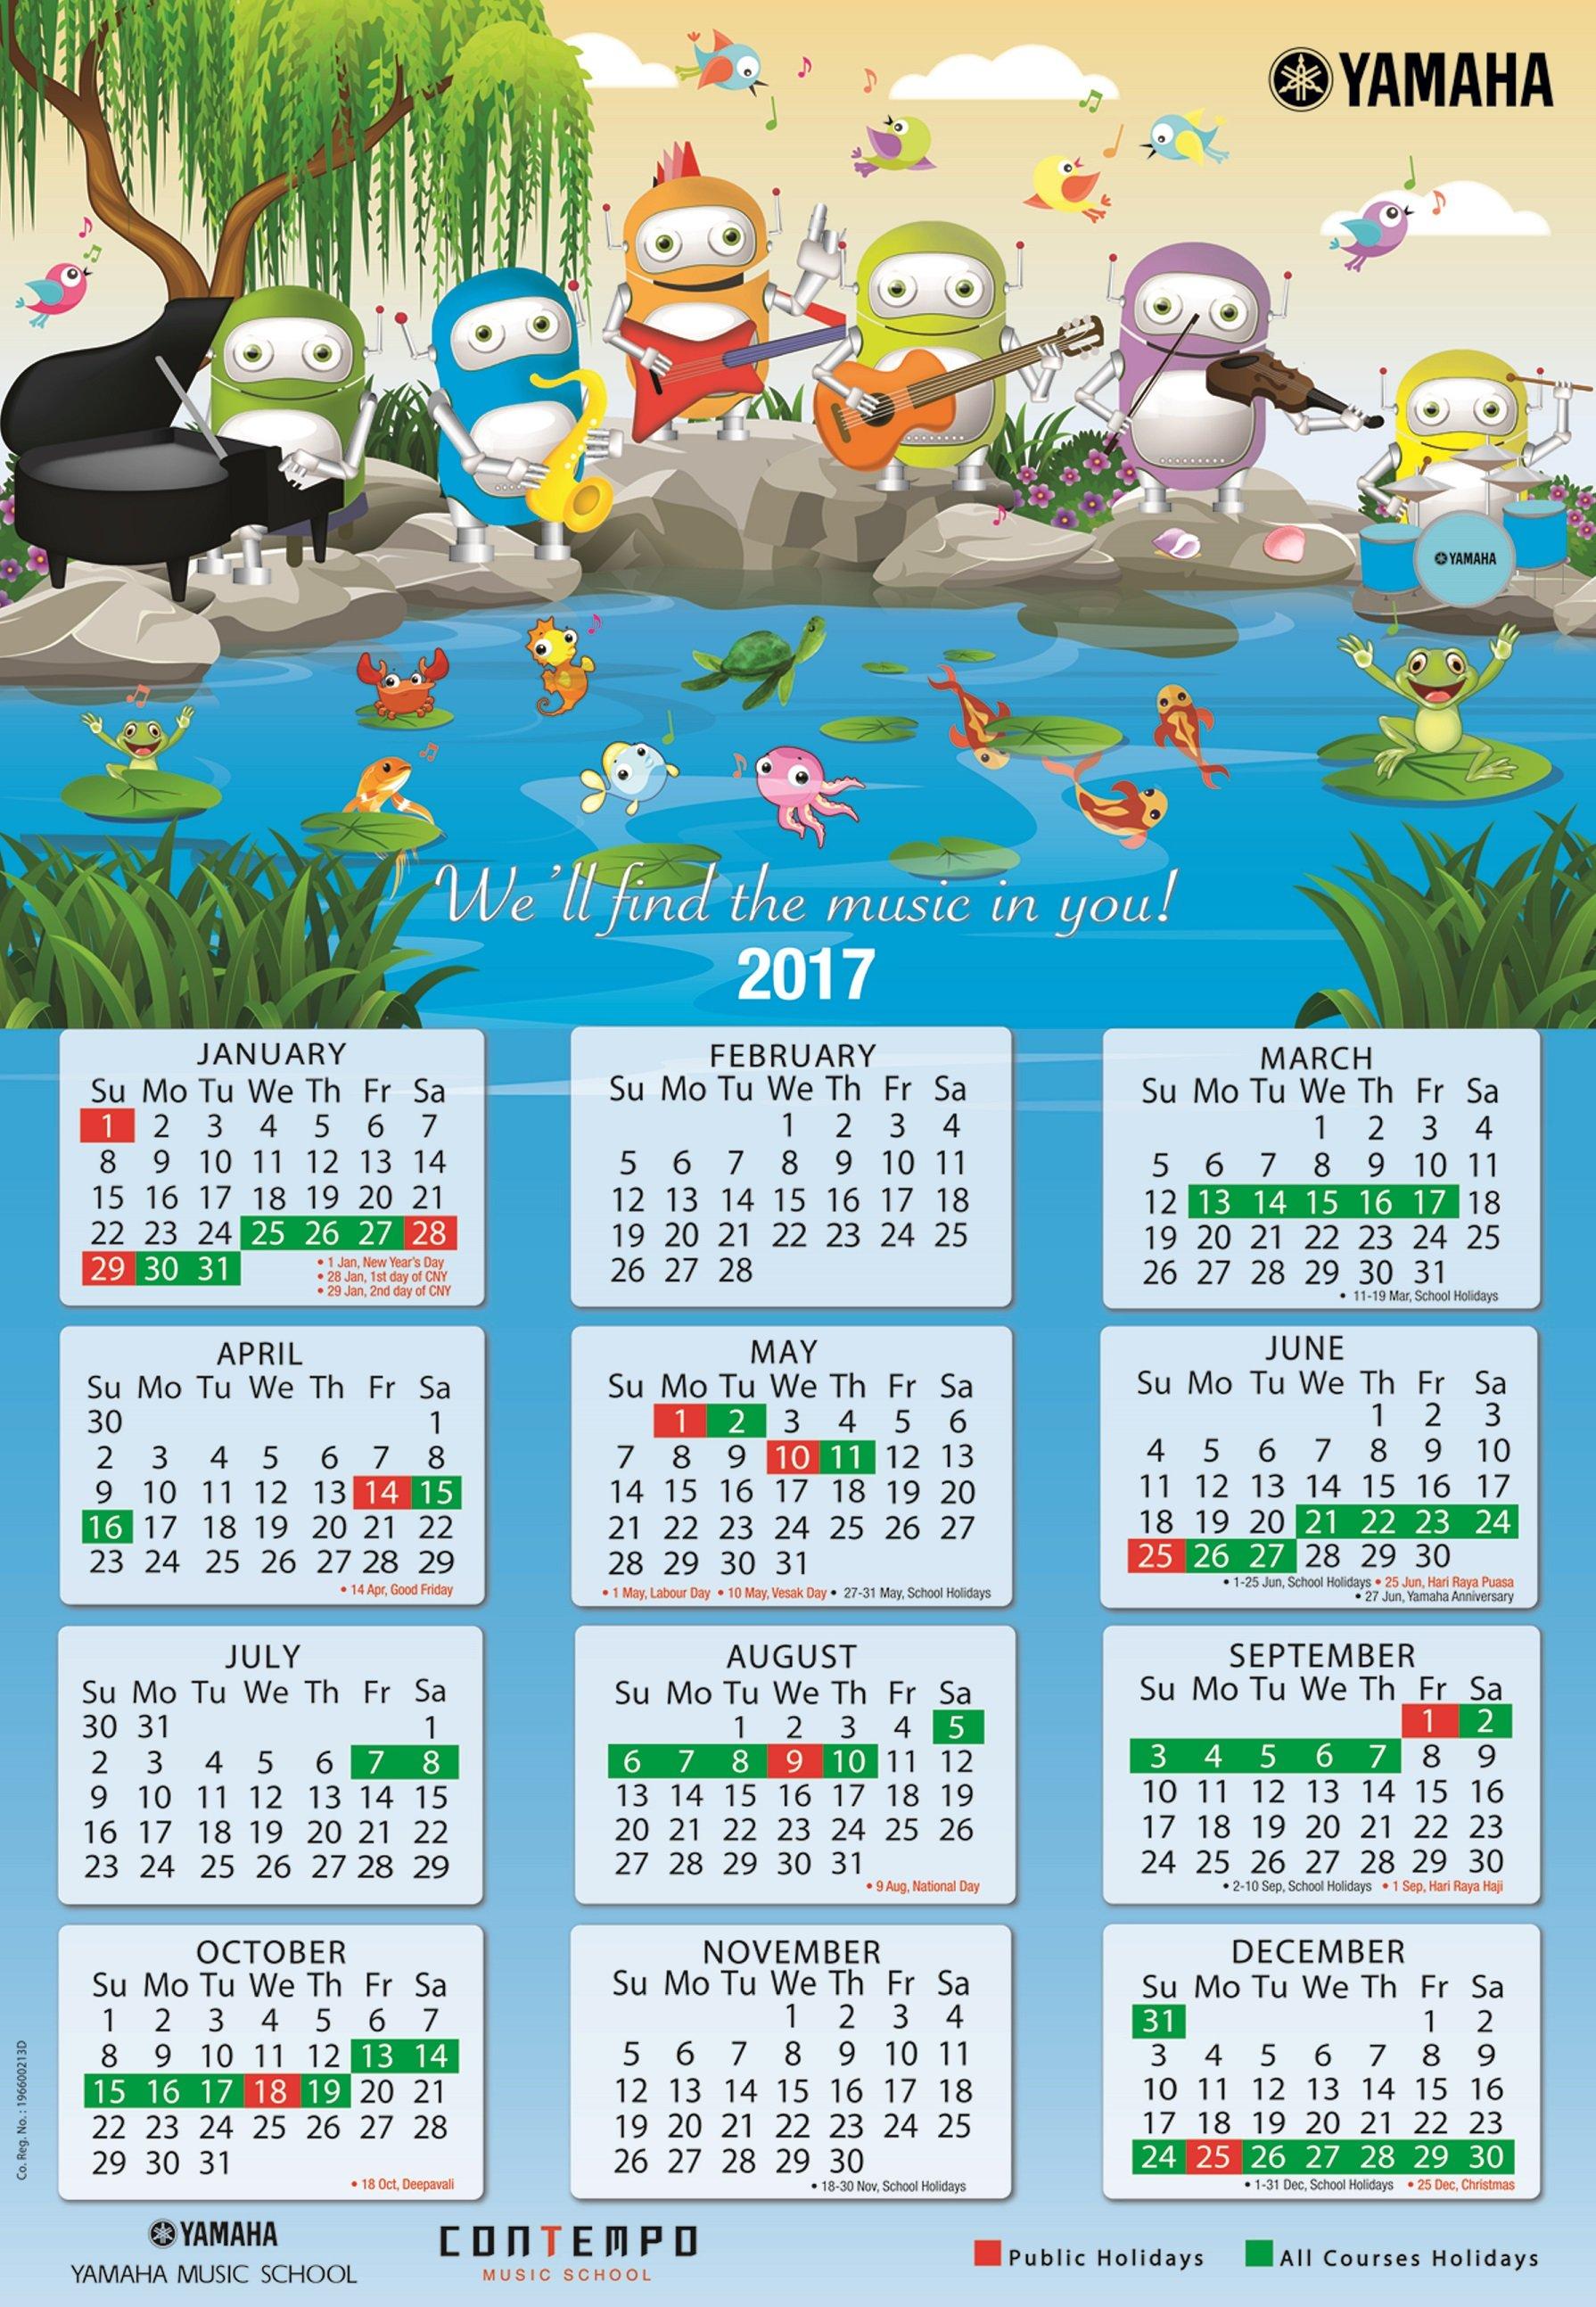 yamaha course calendar 2017